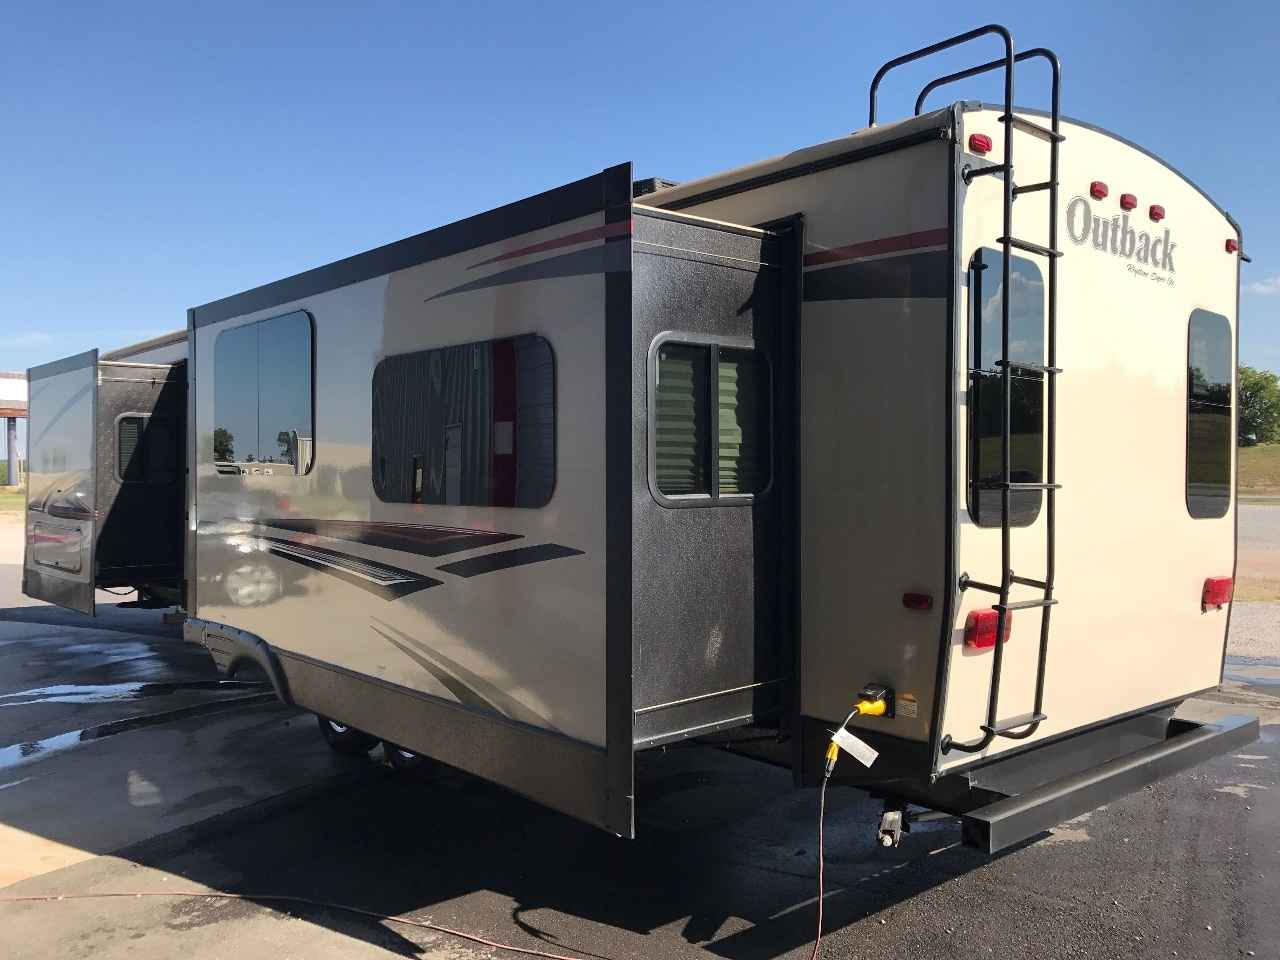 2016 Used Keystone Outback 326rl Travel Trailer In Oklahoma Ok